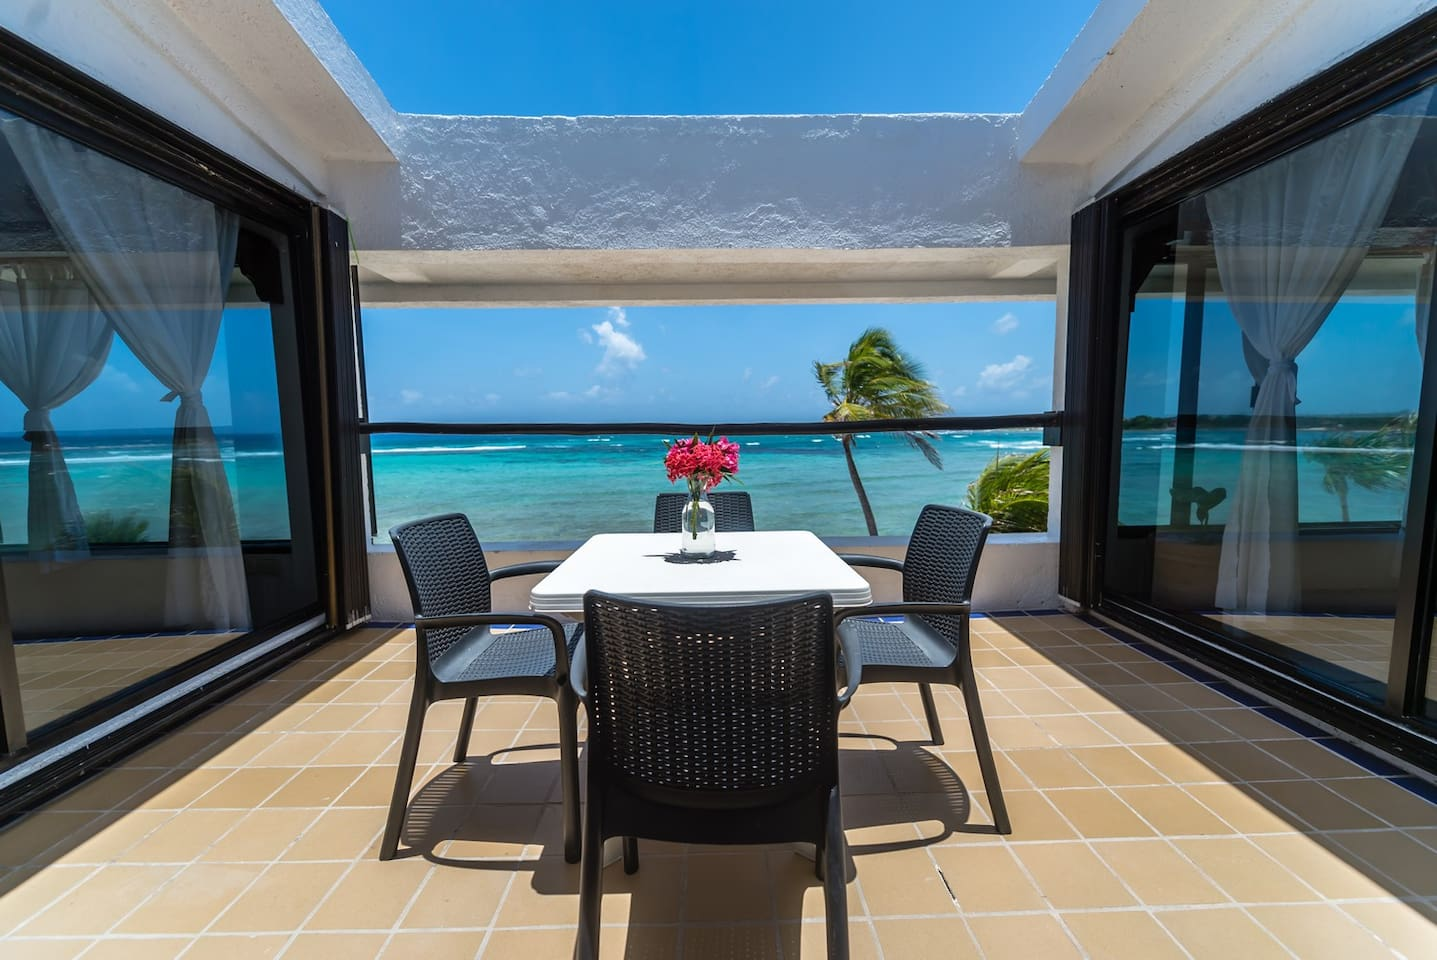 Yool Caanal #5 patio and Caribbean views